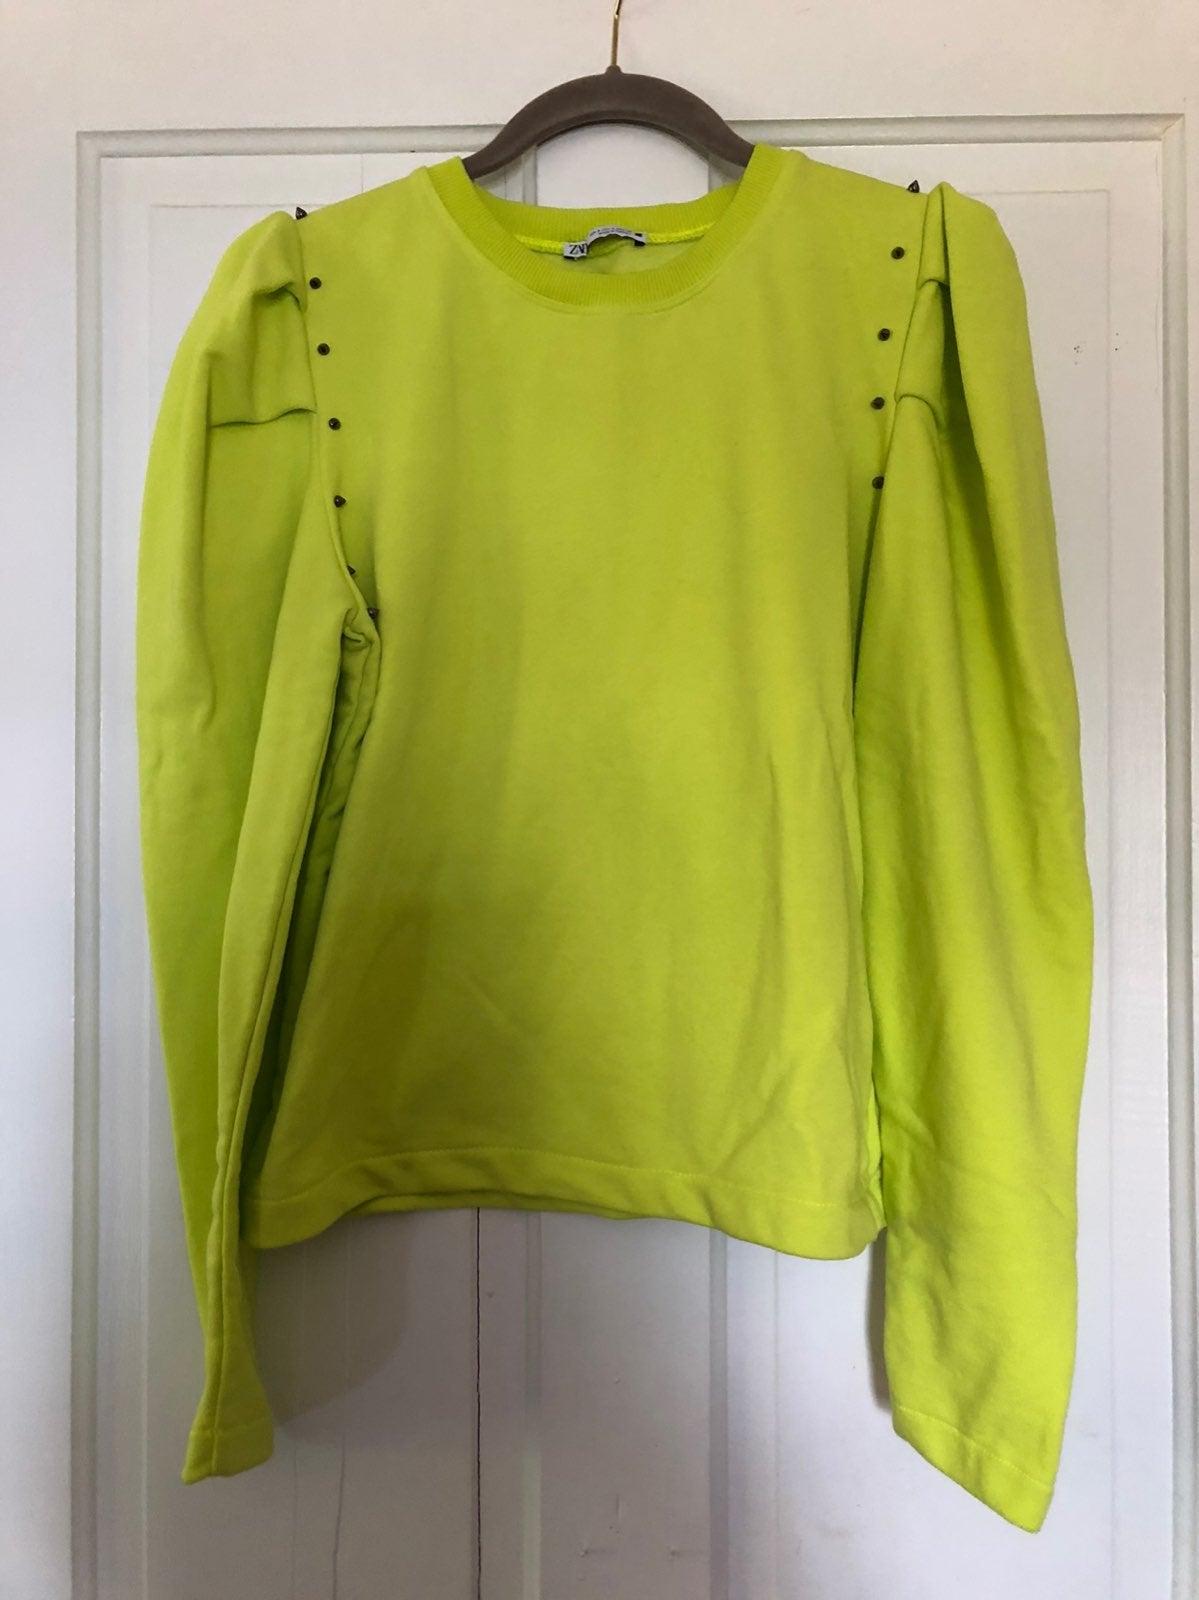 Zara Spike Studded Sweatshirt